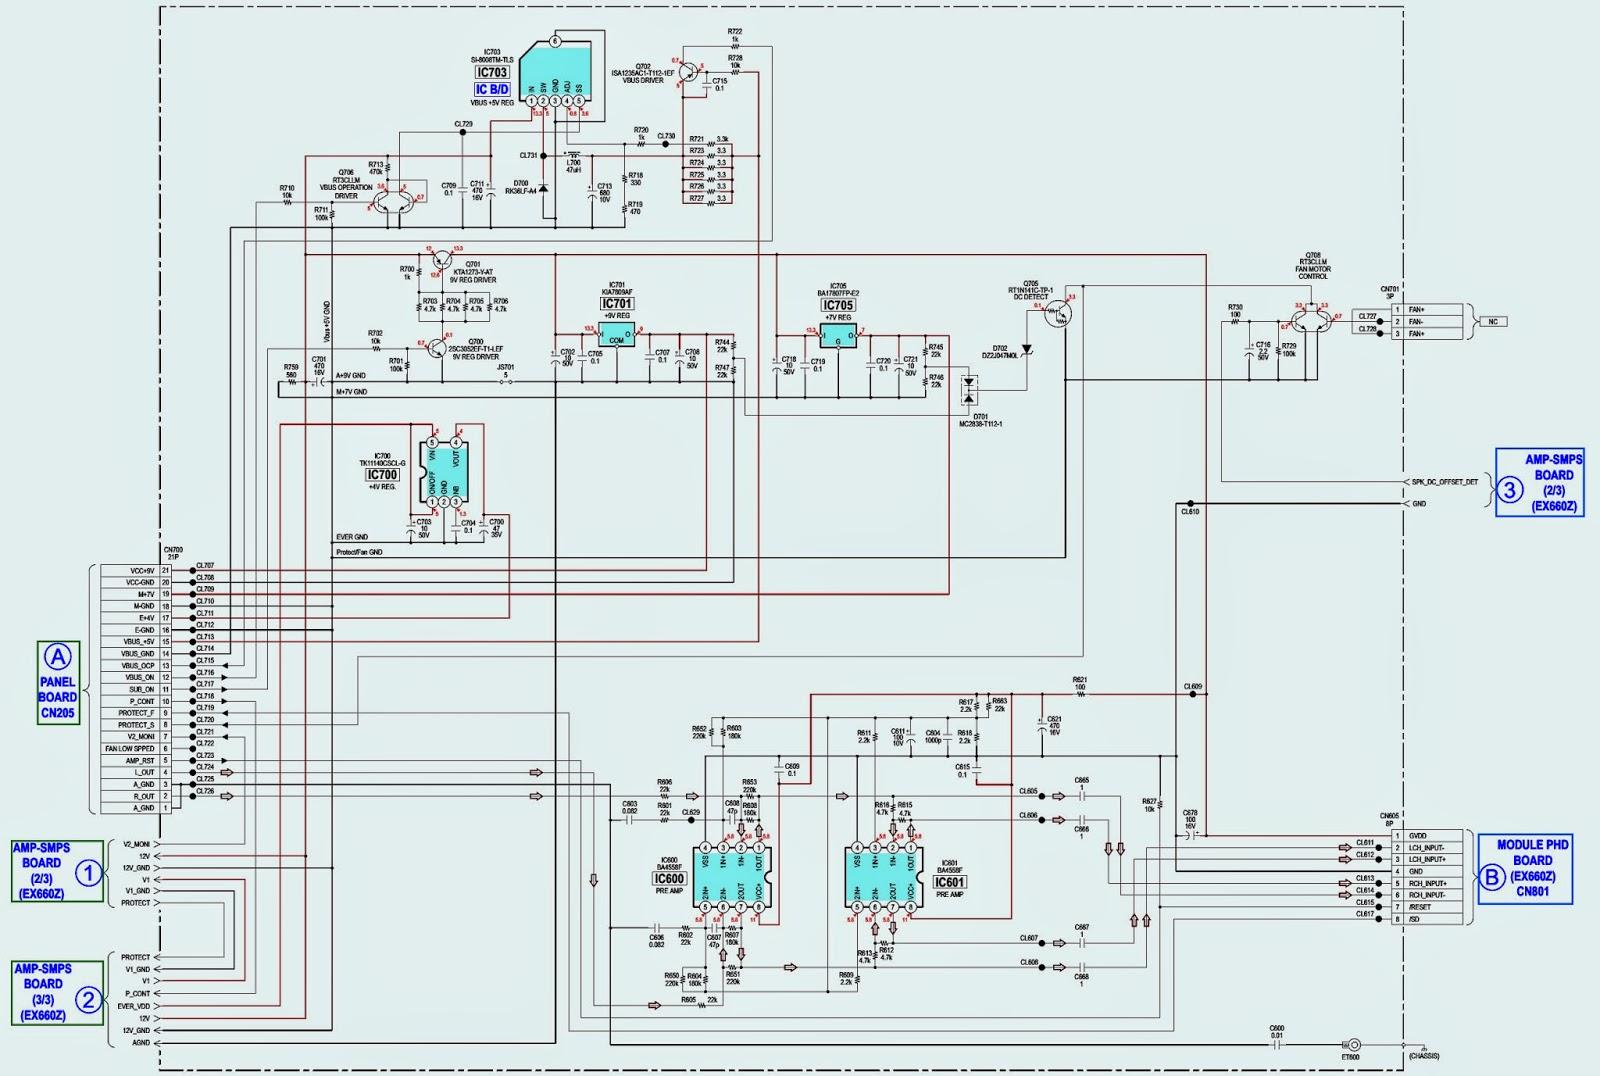 medium resolution of ev eliminator wiring diagram wiring library rh 22 budoshop4you de ev battery boxes ev warrior wiring